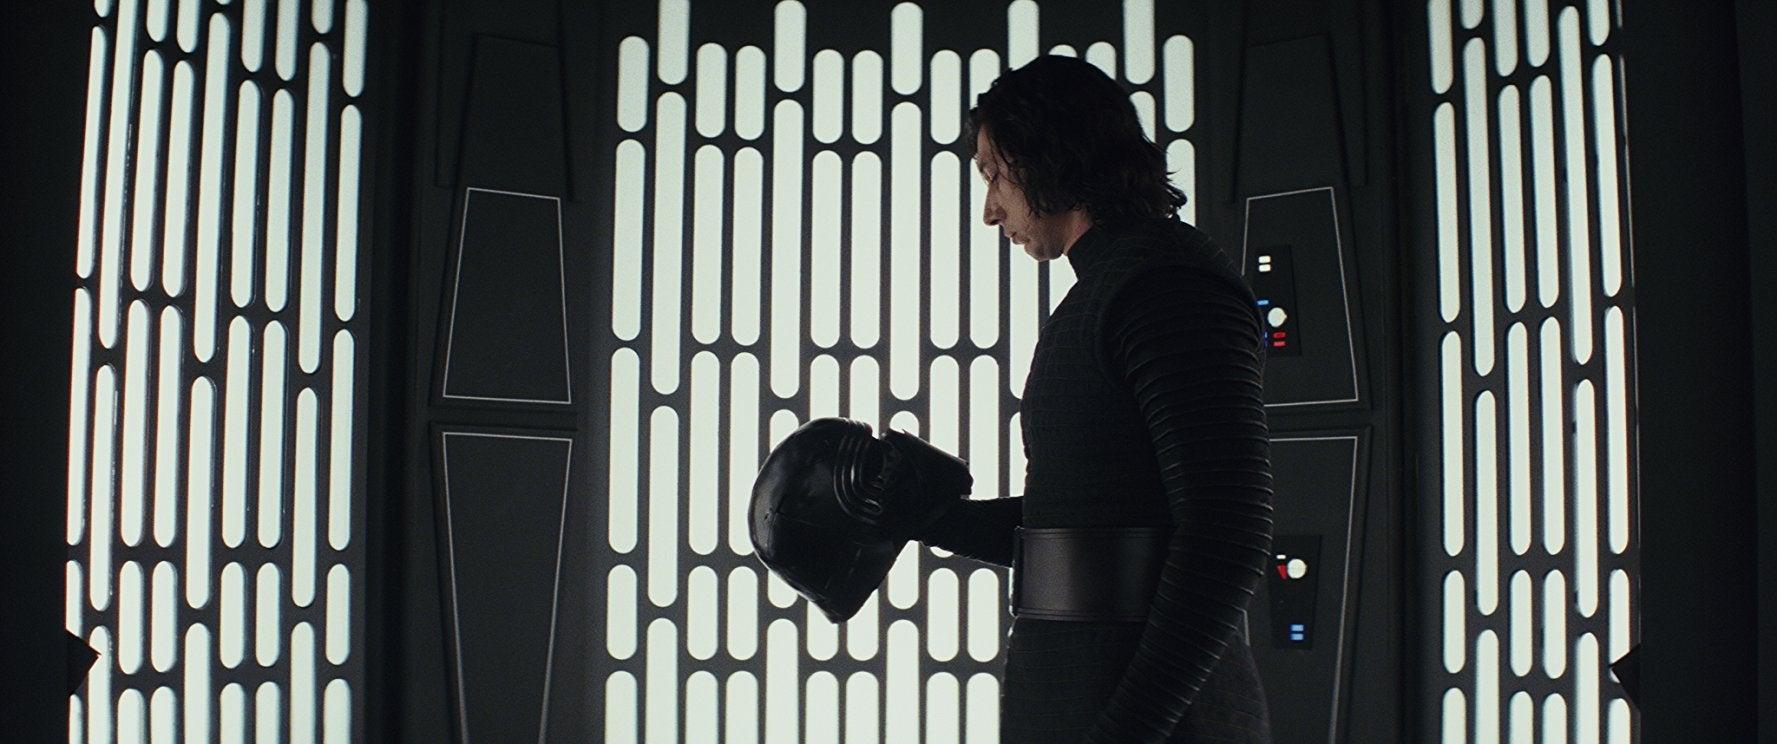 Adam Driver as Kylo Ren in The Last Jedi